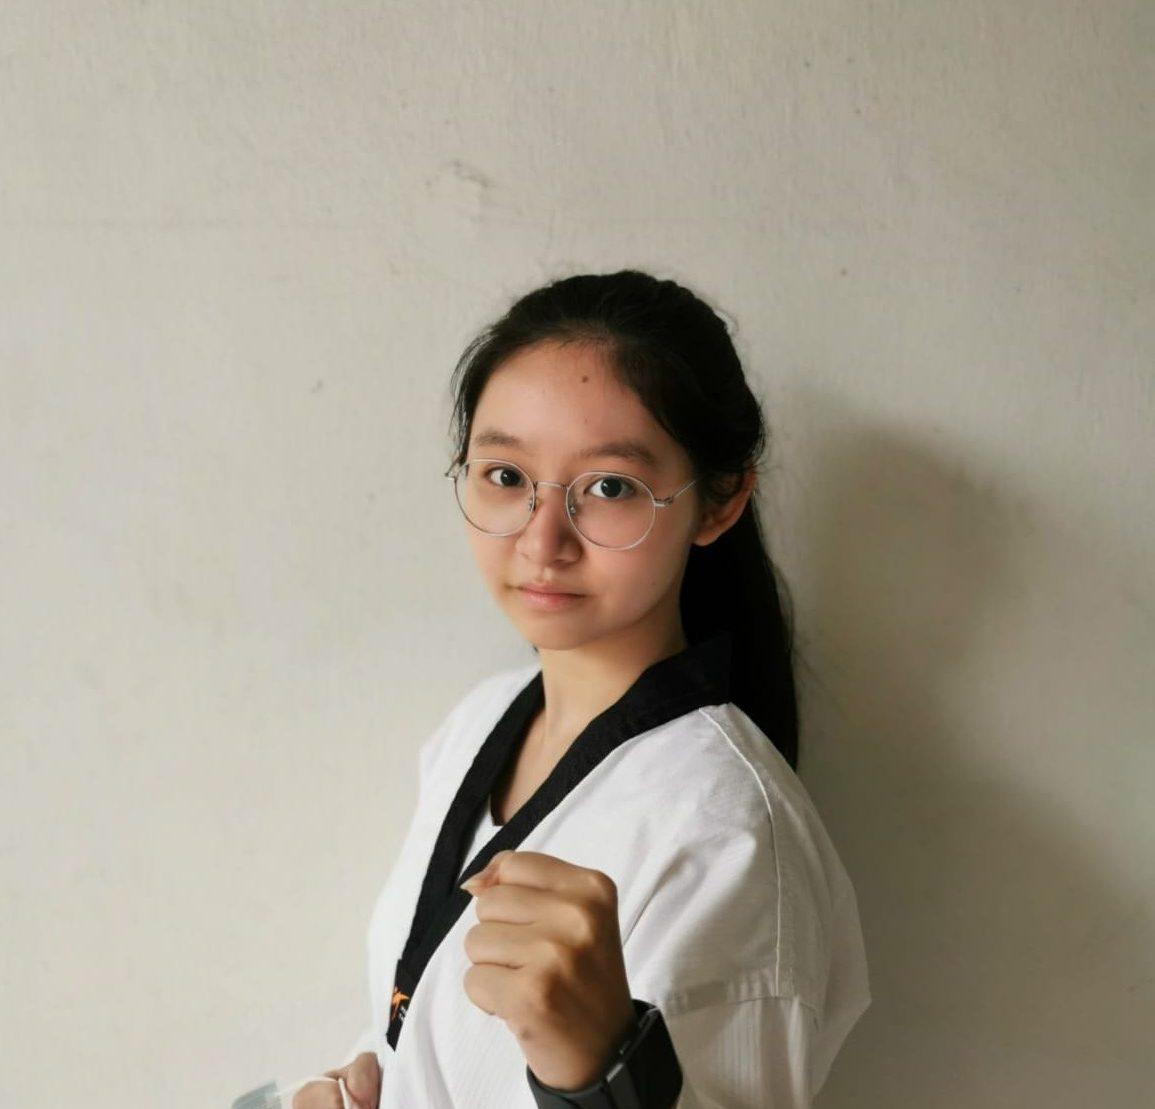 TKD instructor pic